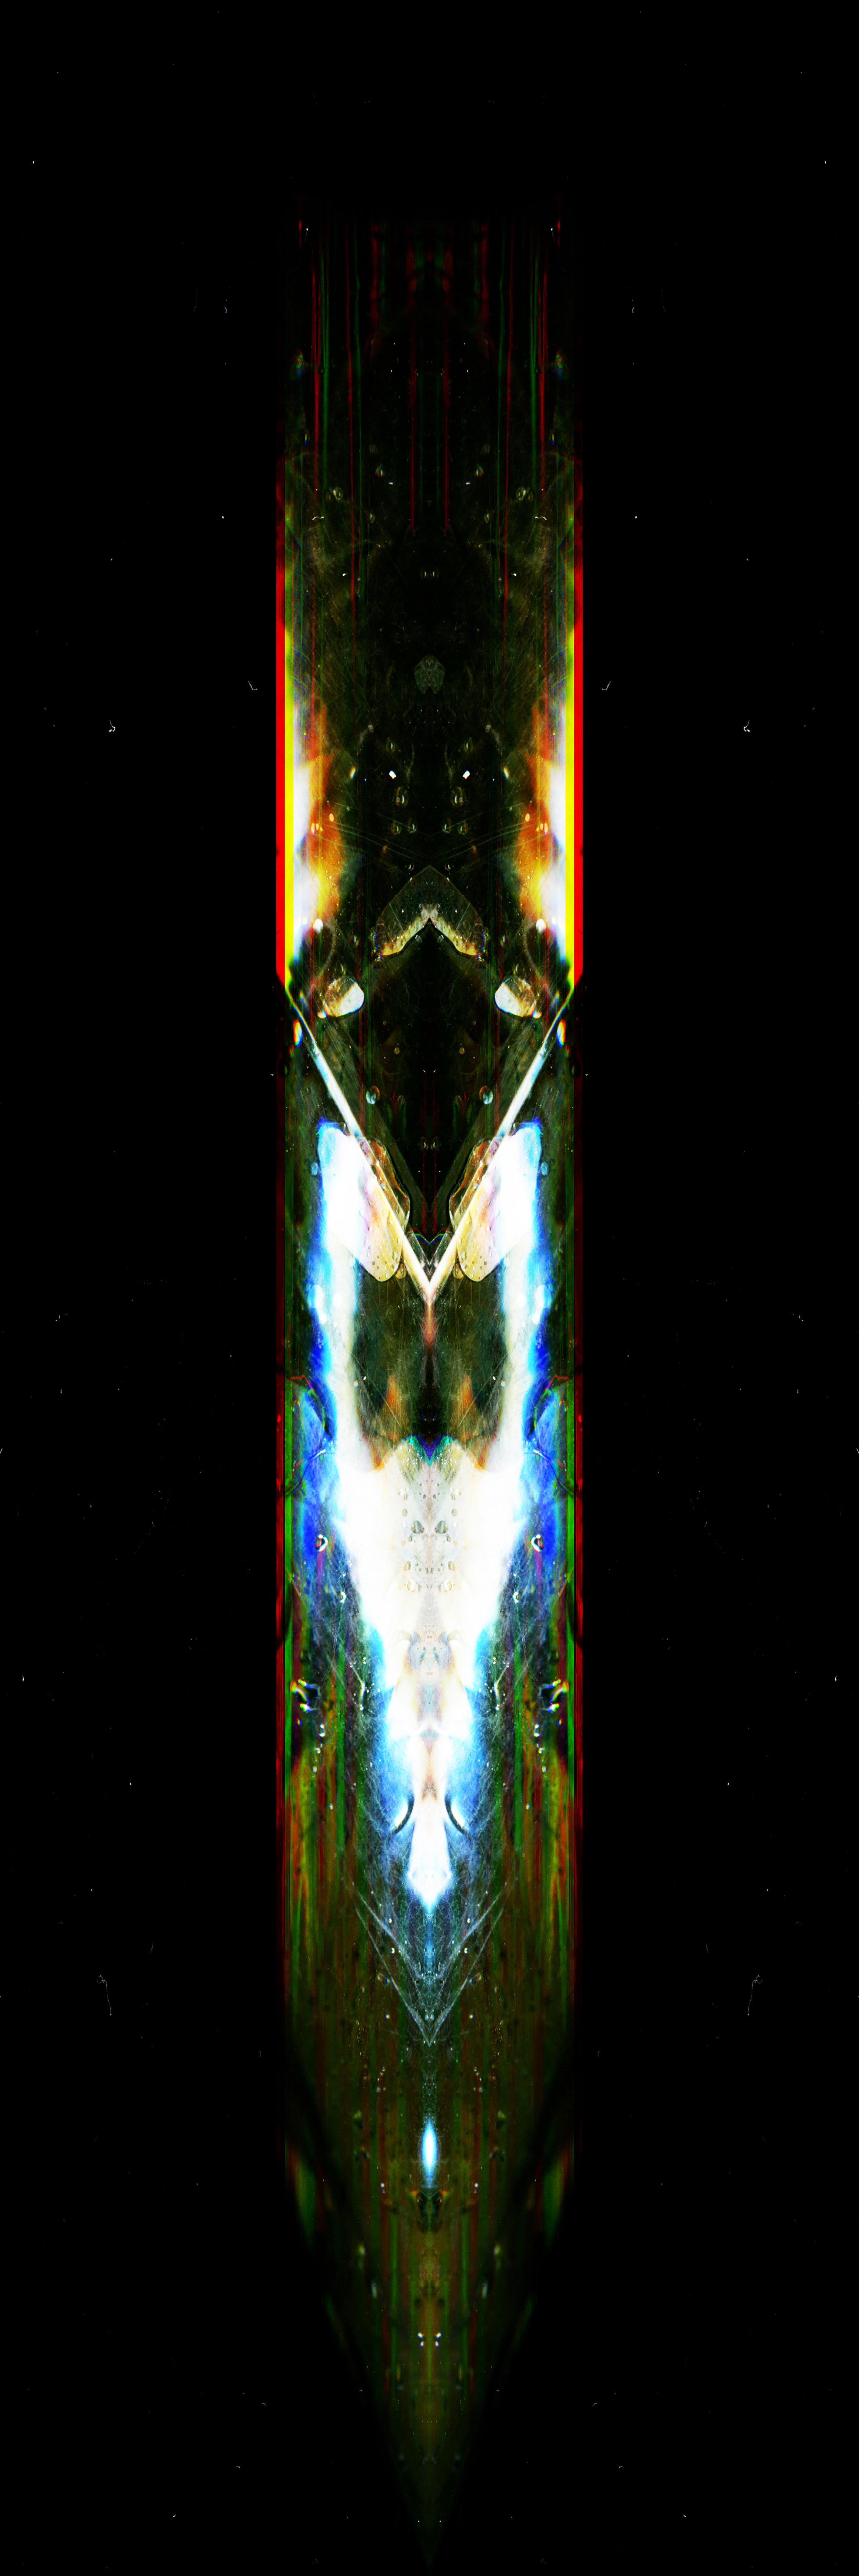 abstract-g-printready.jpg